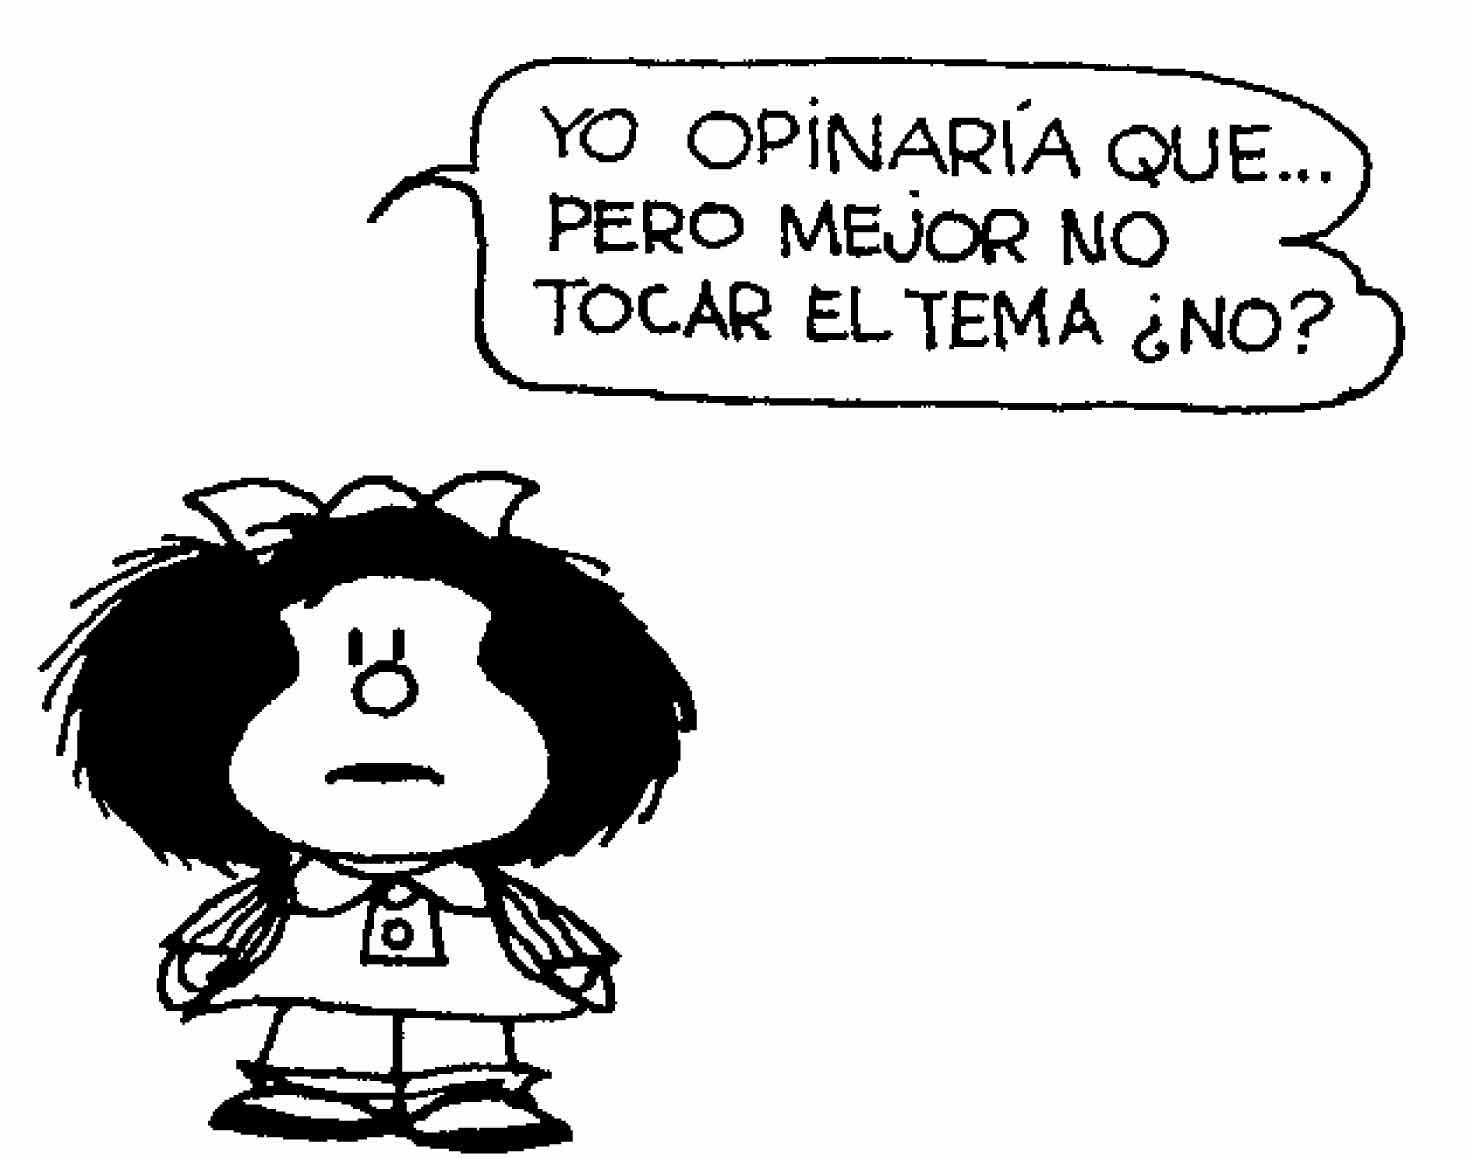 CIBASS-Mafalda-y-su-opini%C3%B3n.jpg